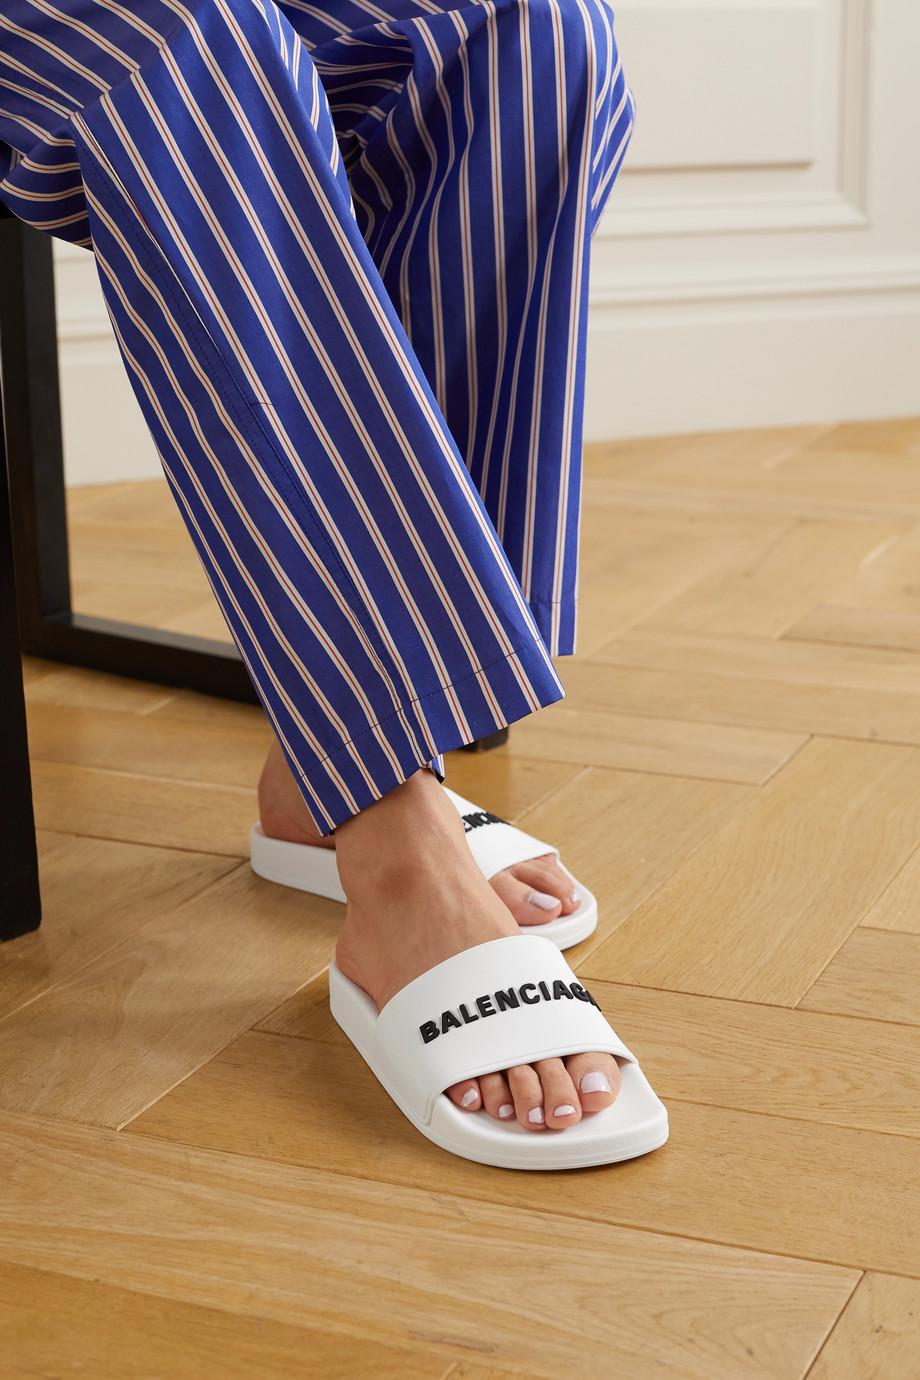 Balenciaga Pool Pantoletten aus Gummi mit Logoprägung